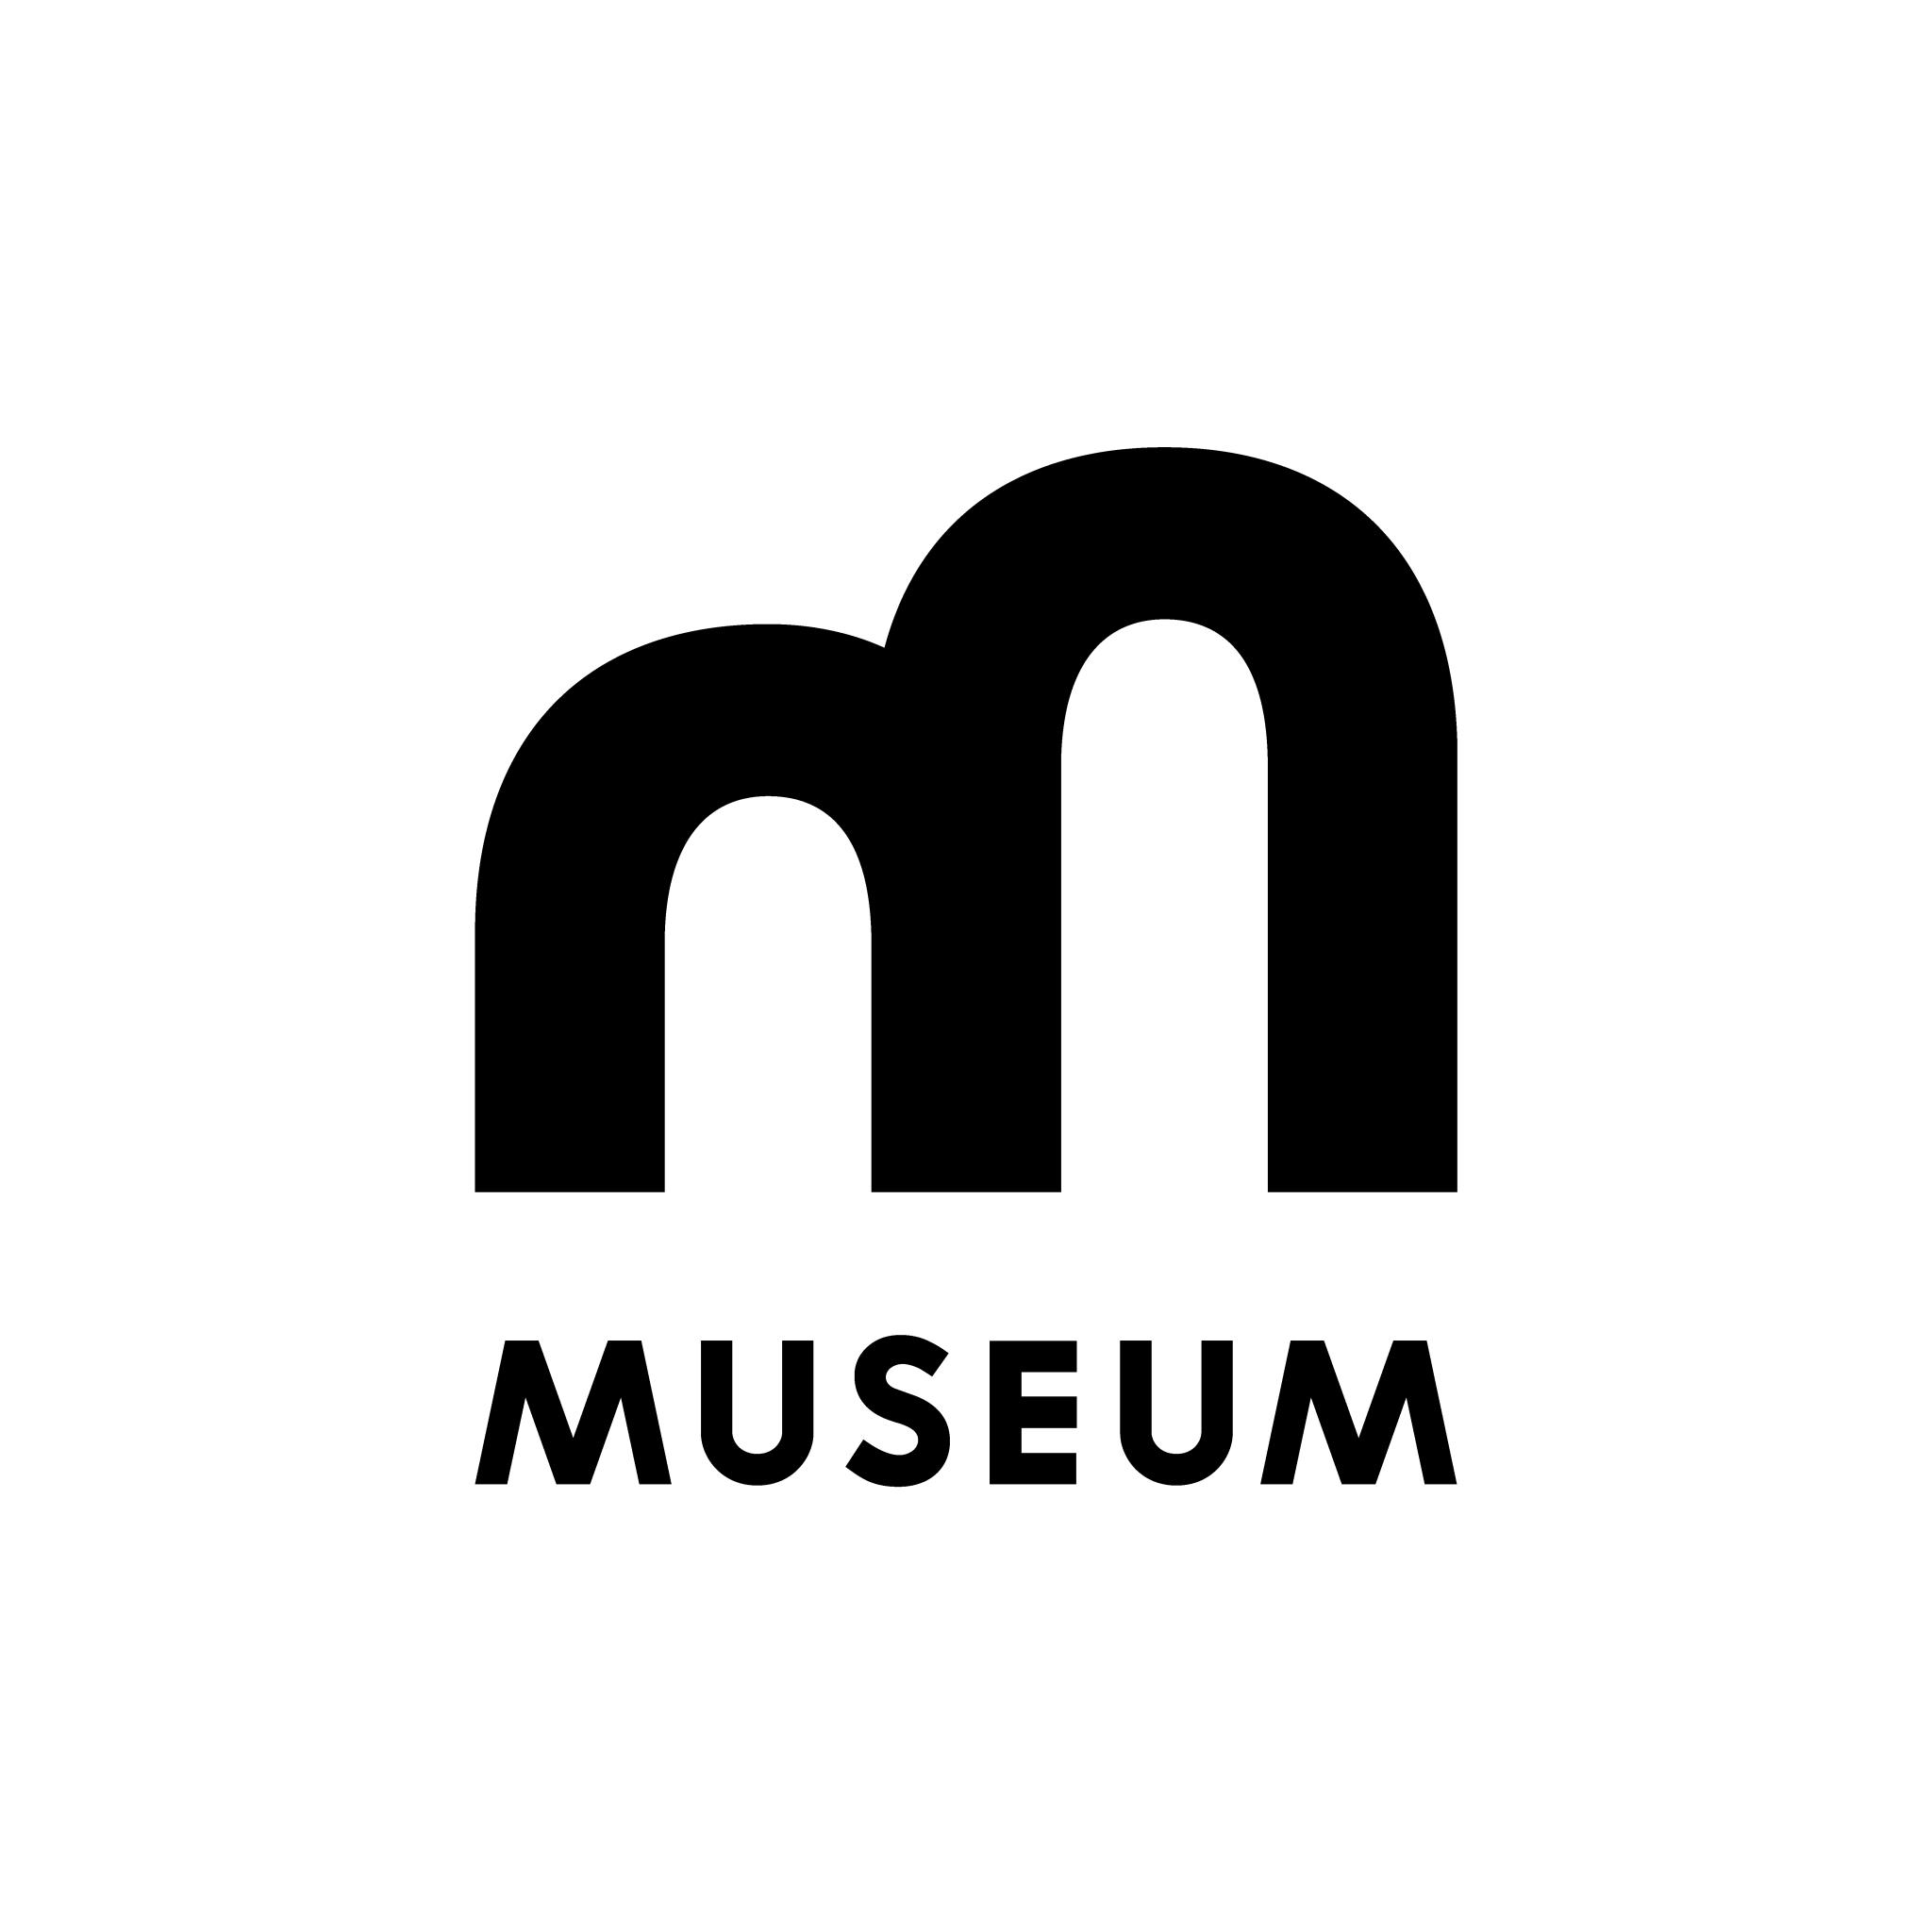 logo_museum-noir1 (1).png